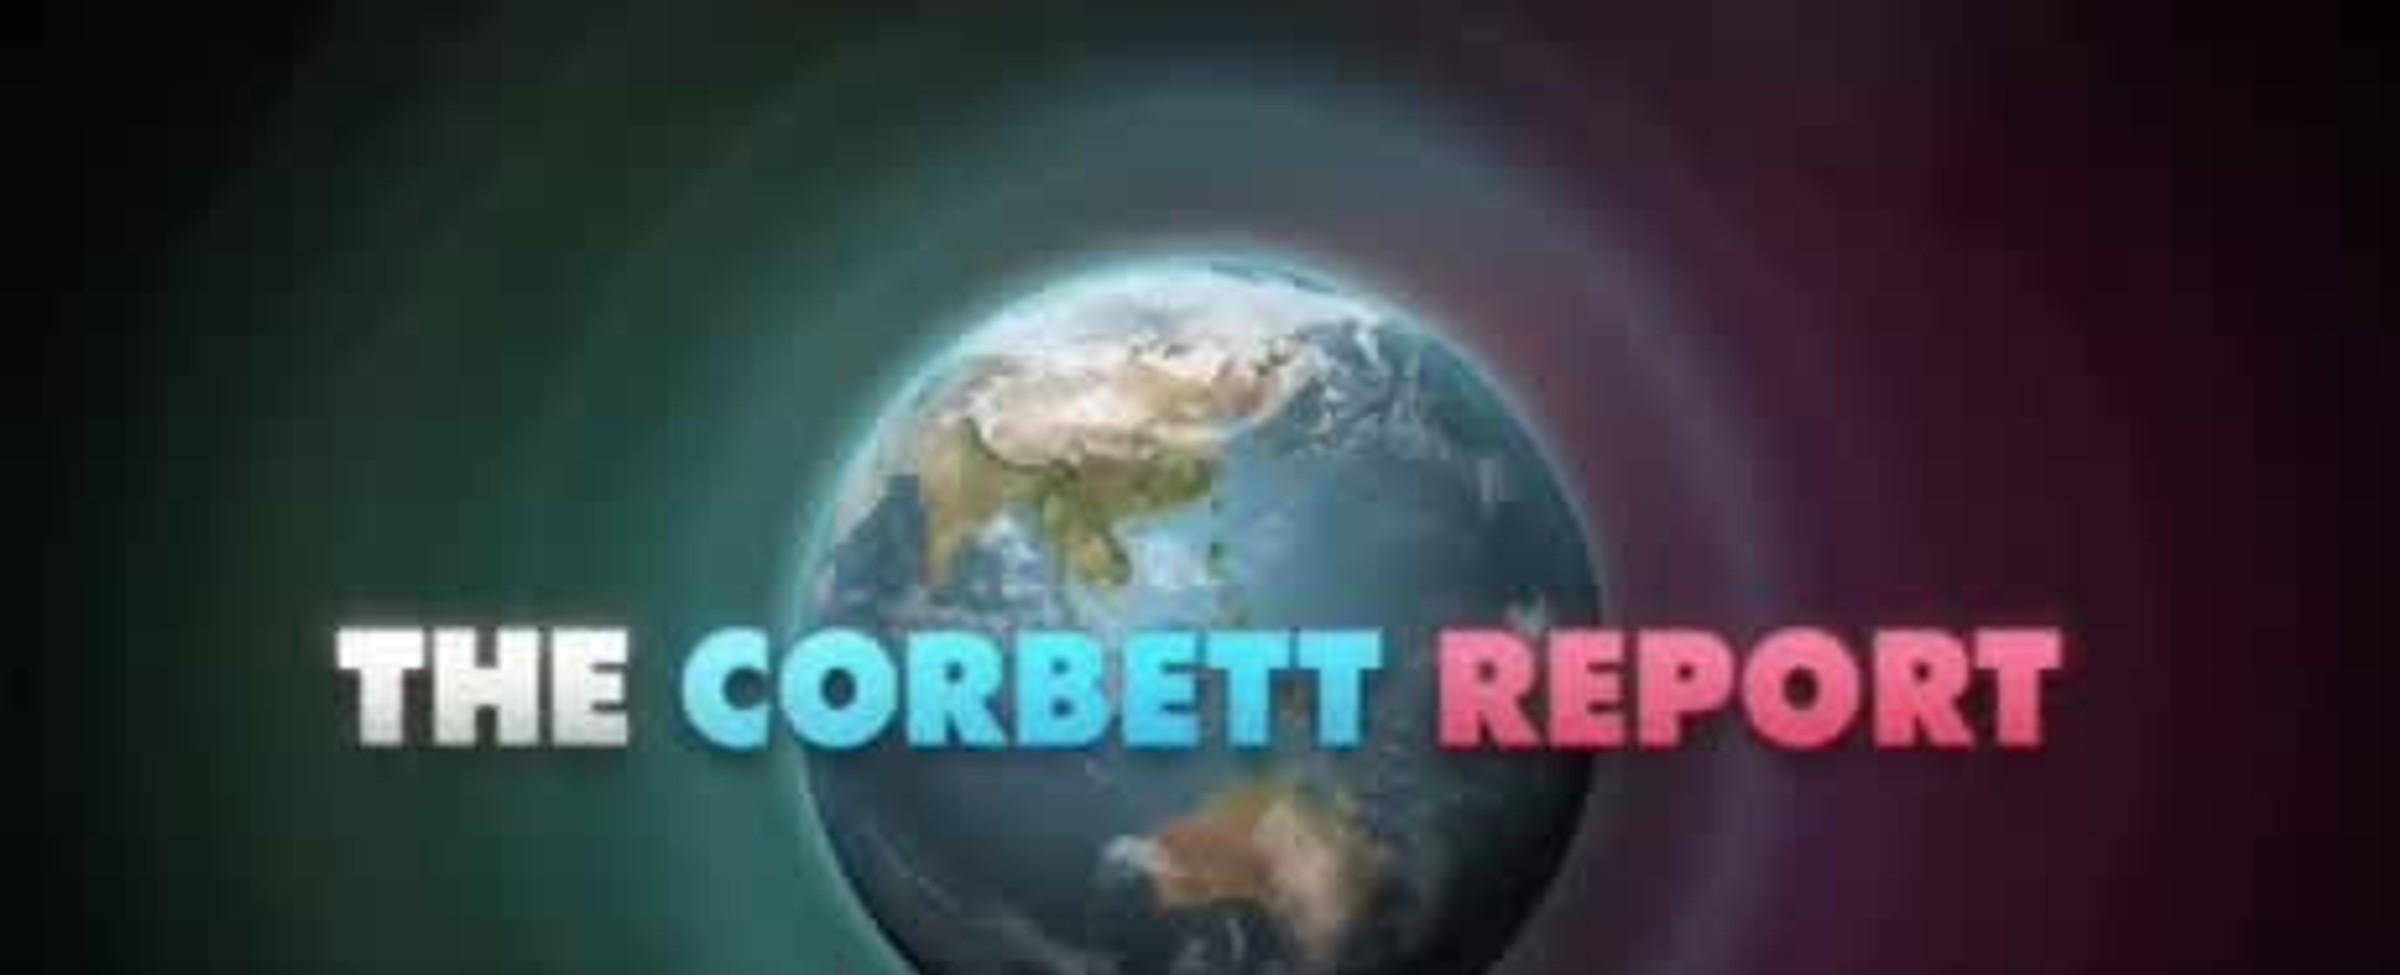 Corbettova zpráva